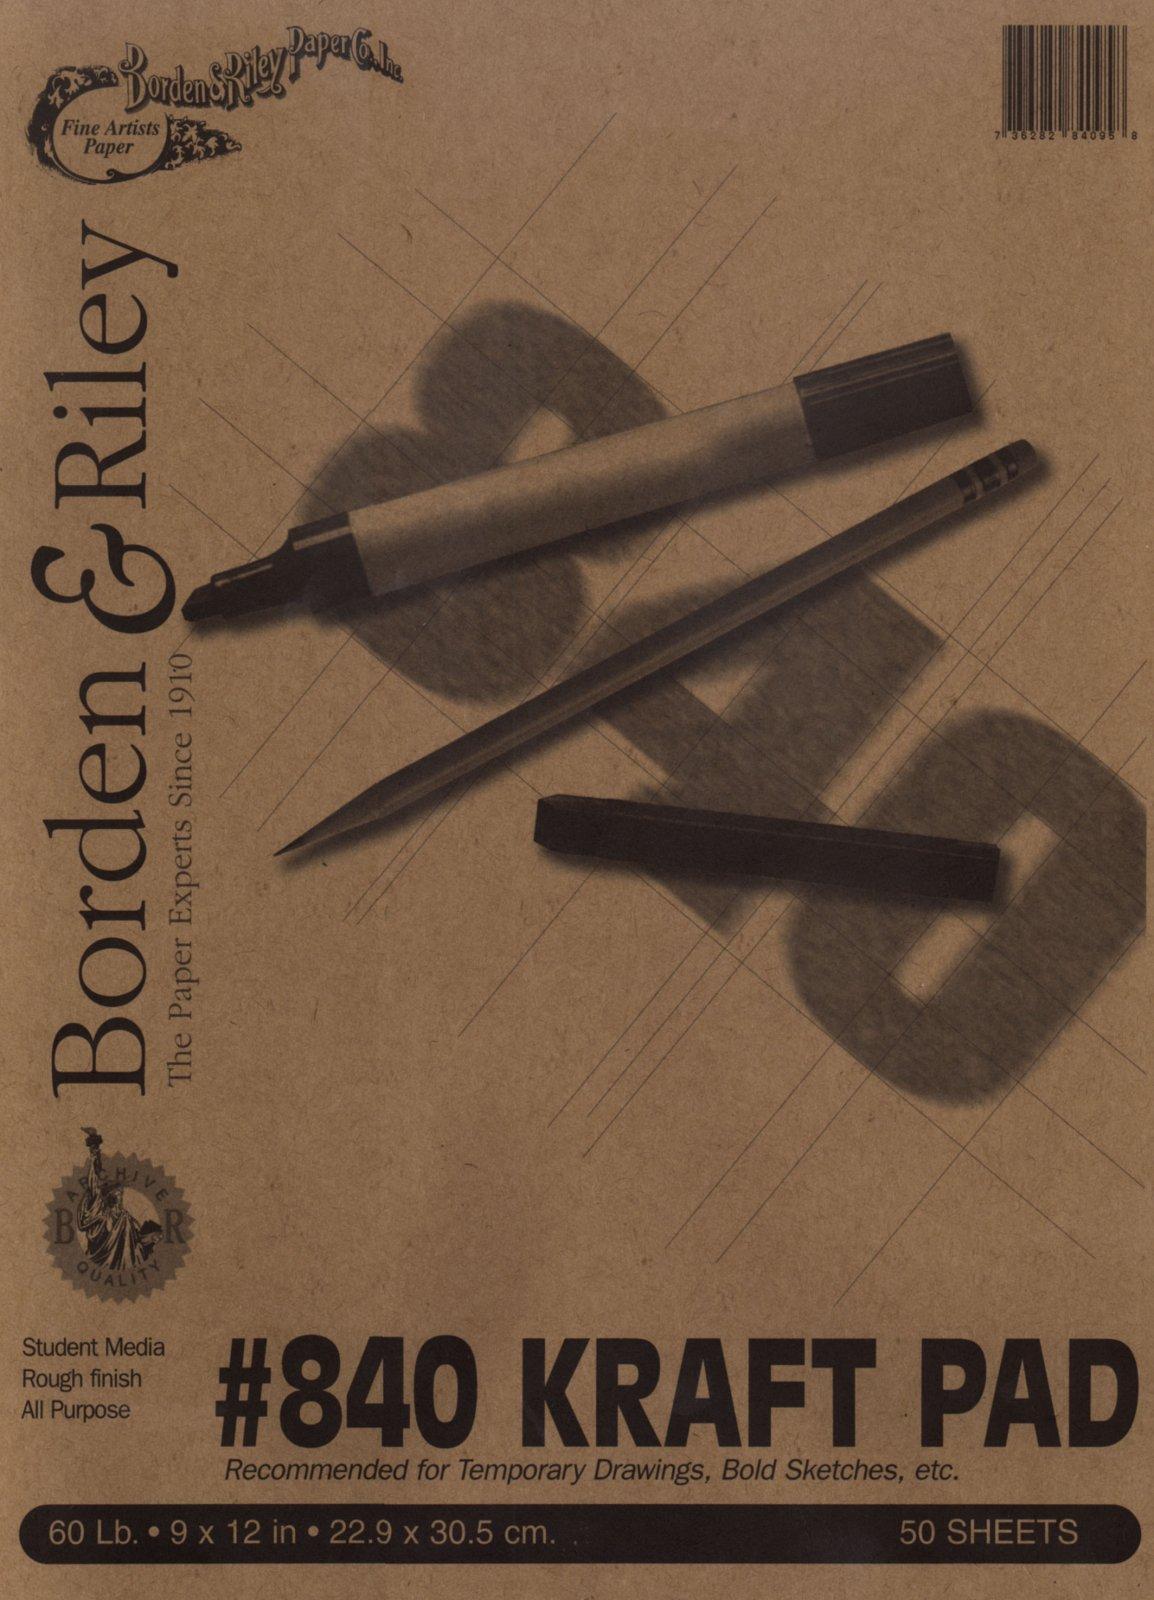 #840 Kraft Paper Pad